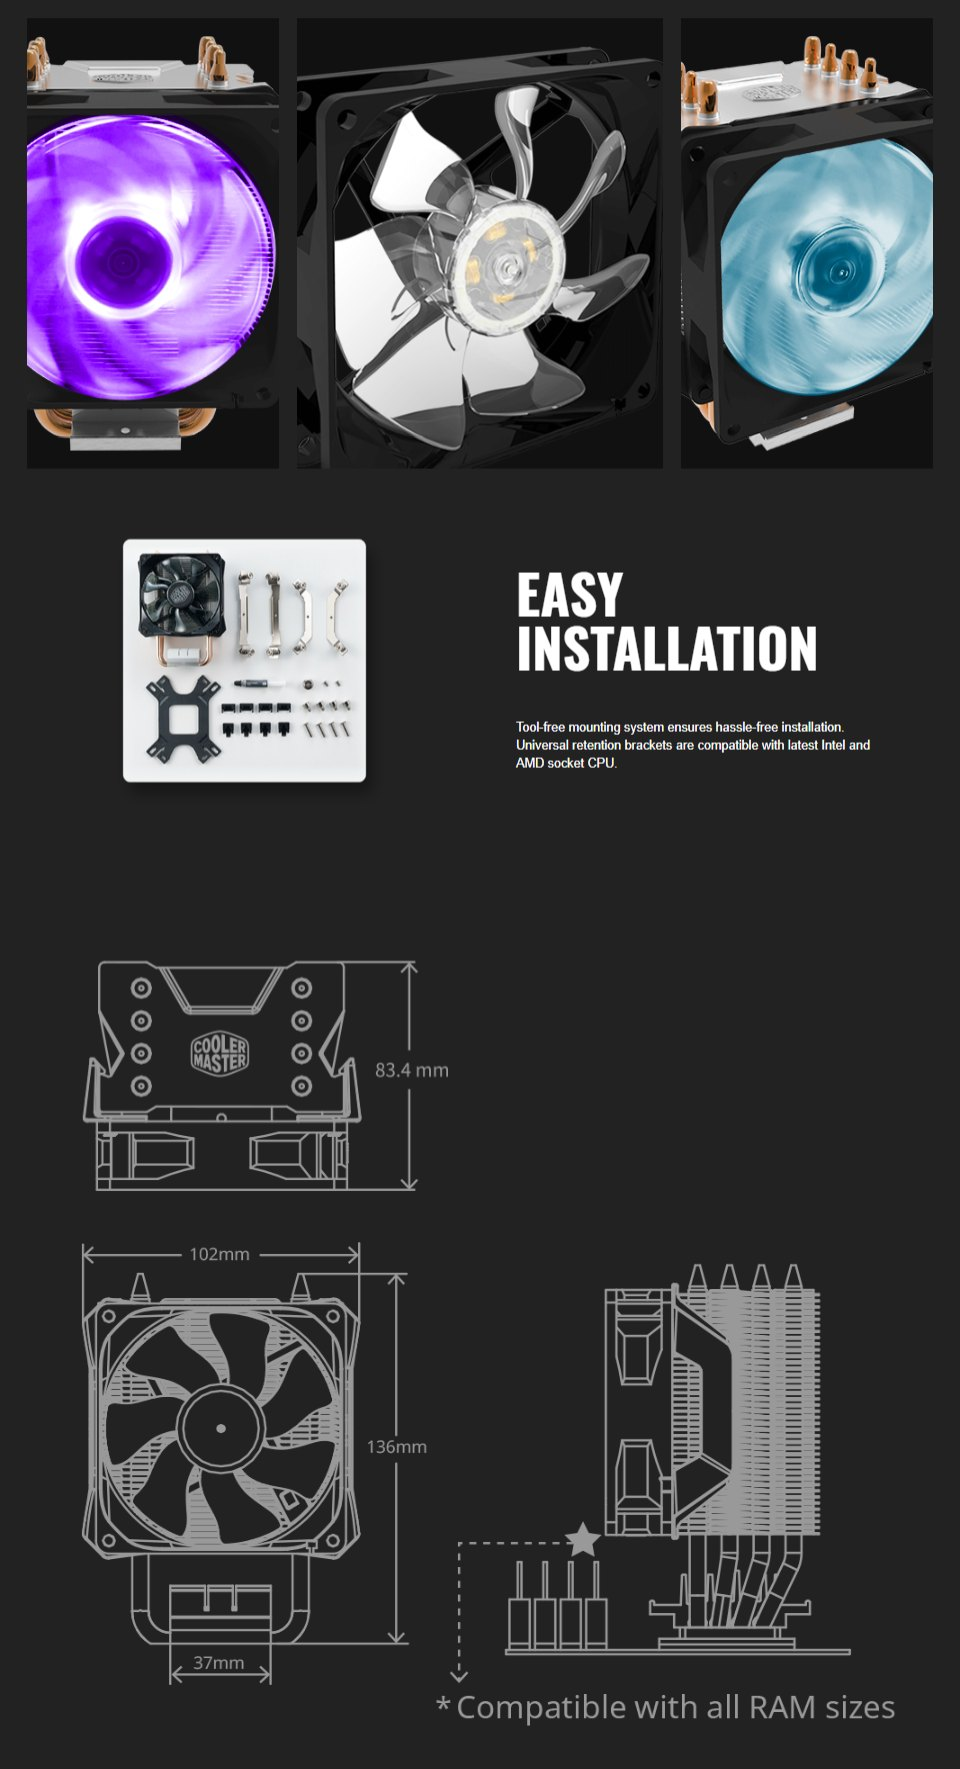 Cooler Master Hyper H411R RGB CPU Cooler features 3